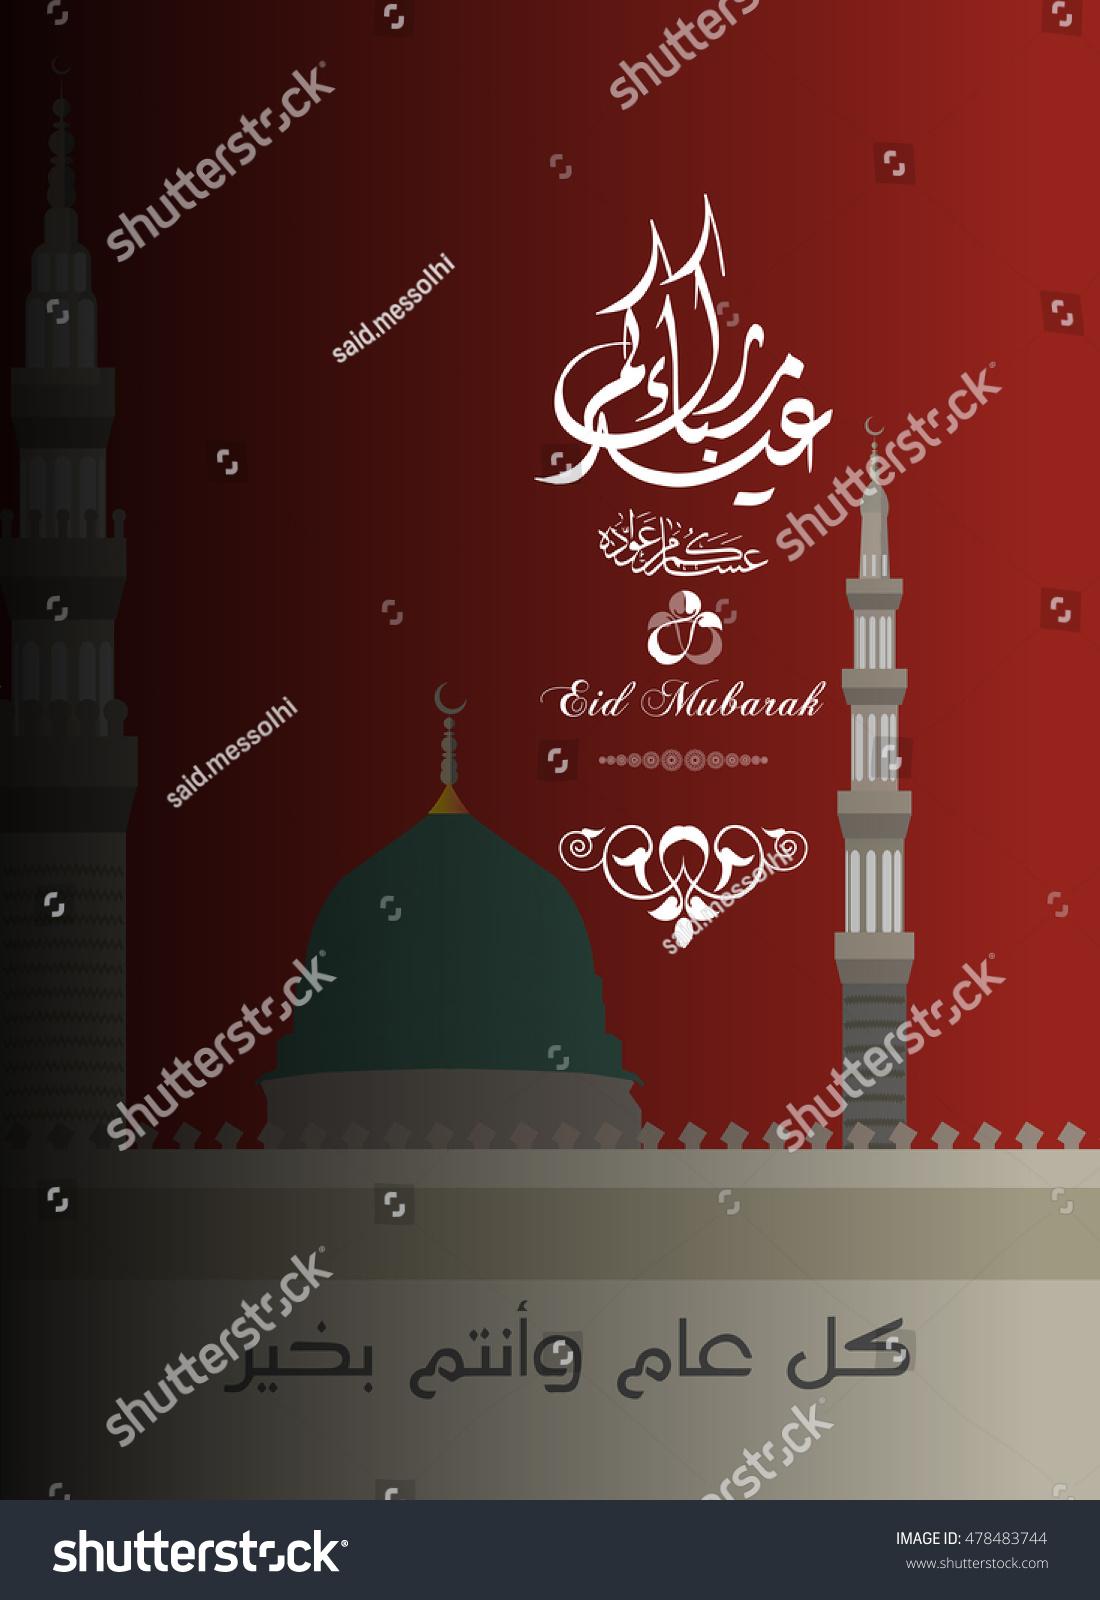 Wonderful Idd Eid Al-Fitr Greeting - stock-vector-greeting-card-and-wishes-of-eid-al-fitr-and-eid-ul-adha-saeed-mubarak-with-arabic-calligraphy-478483744  Trends_32772 .jpg